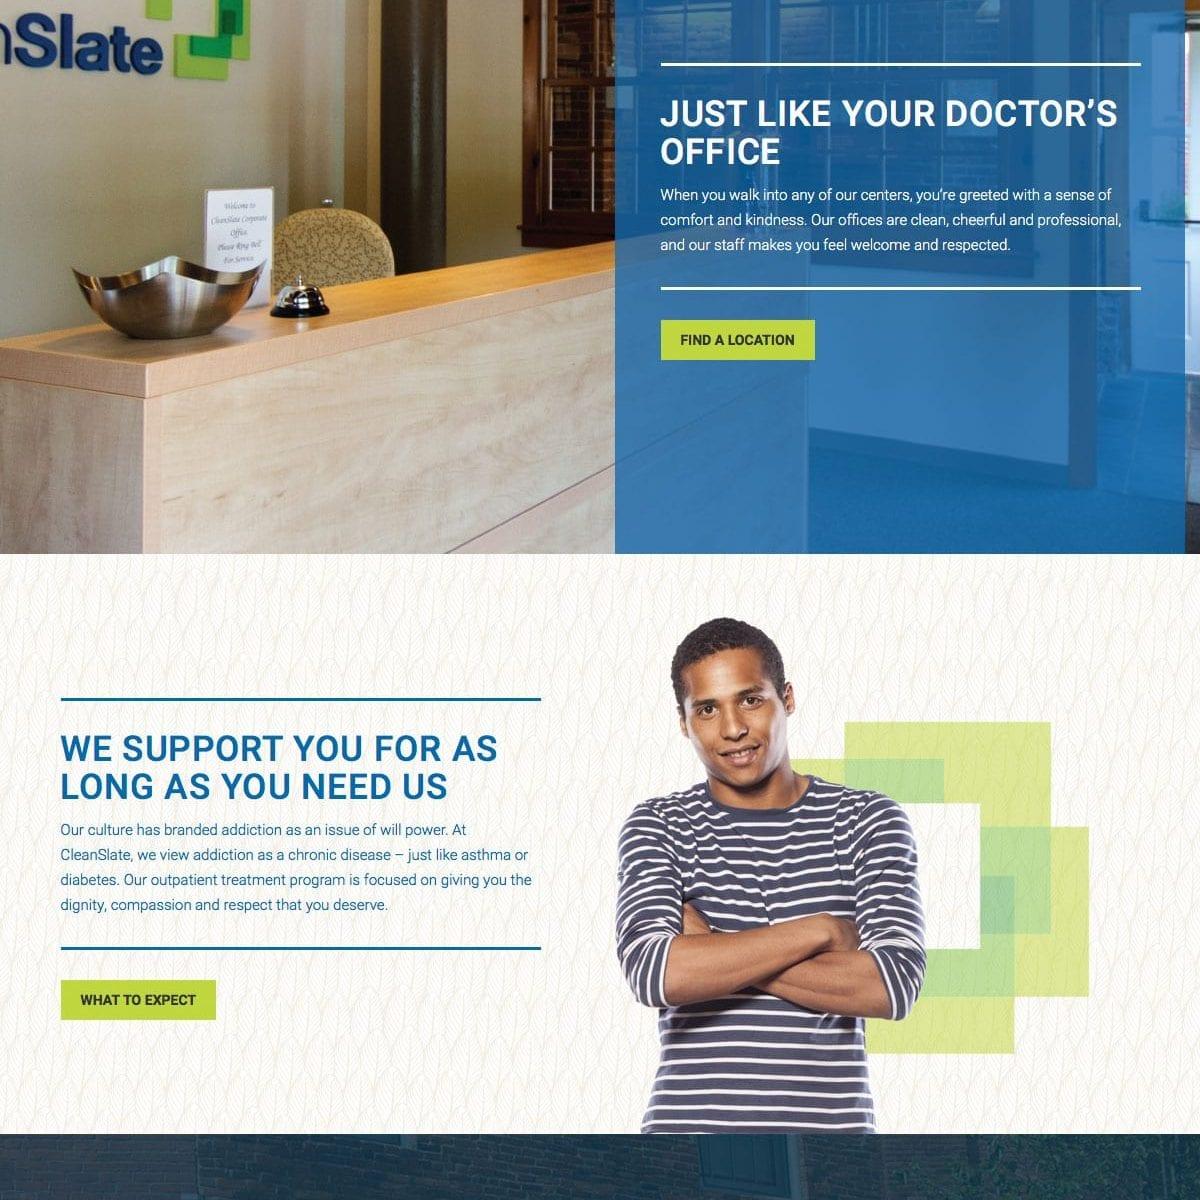 CleanSlate-_-Addiction-Treatment-and-Rehabilitation-Centers-(20160226)